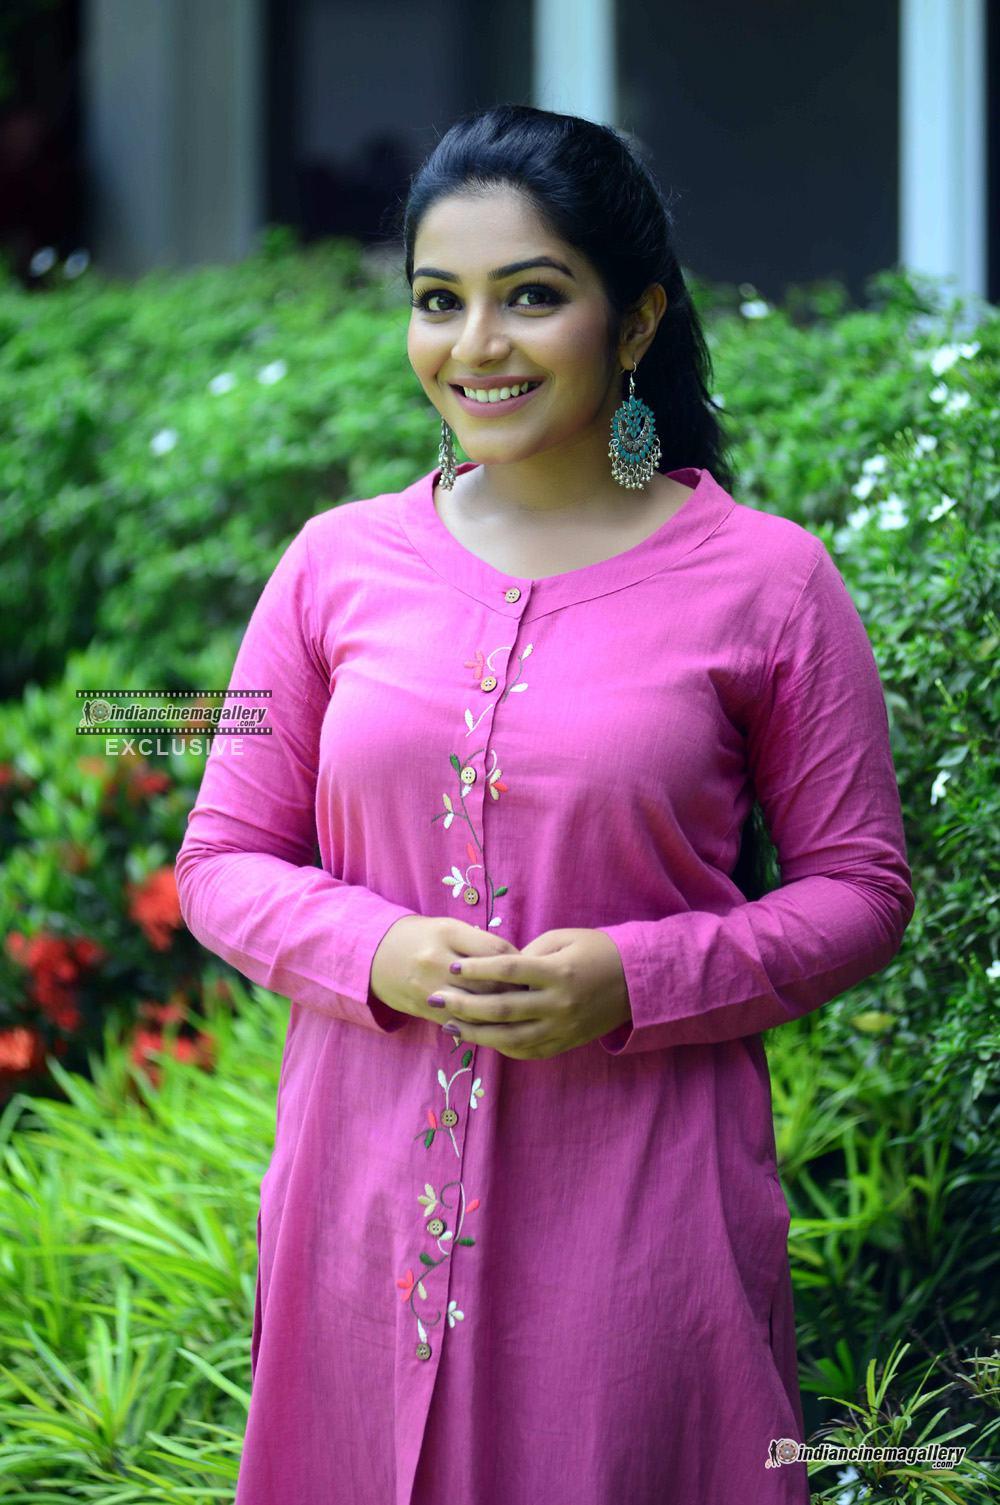 Rajisha Vijayan at oru cinemakkaran promo shoot (6)